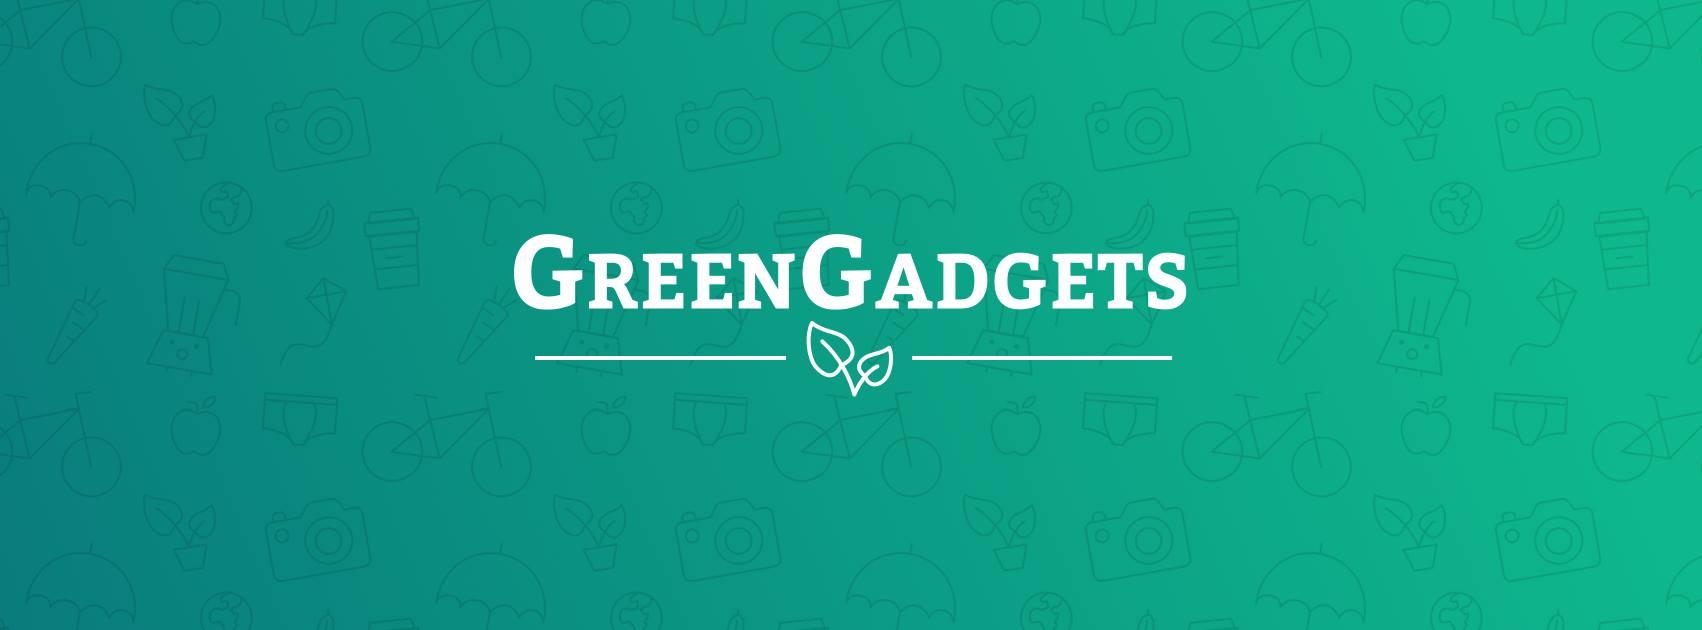 Green Gadgets -